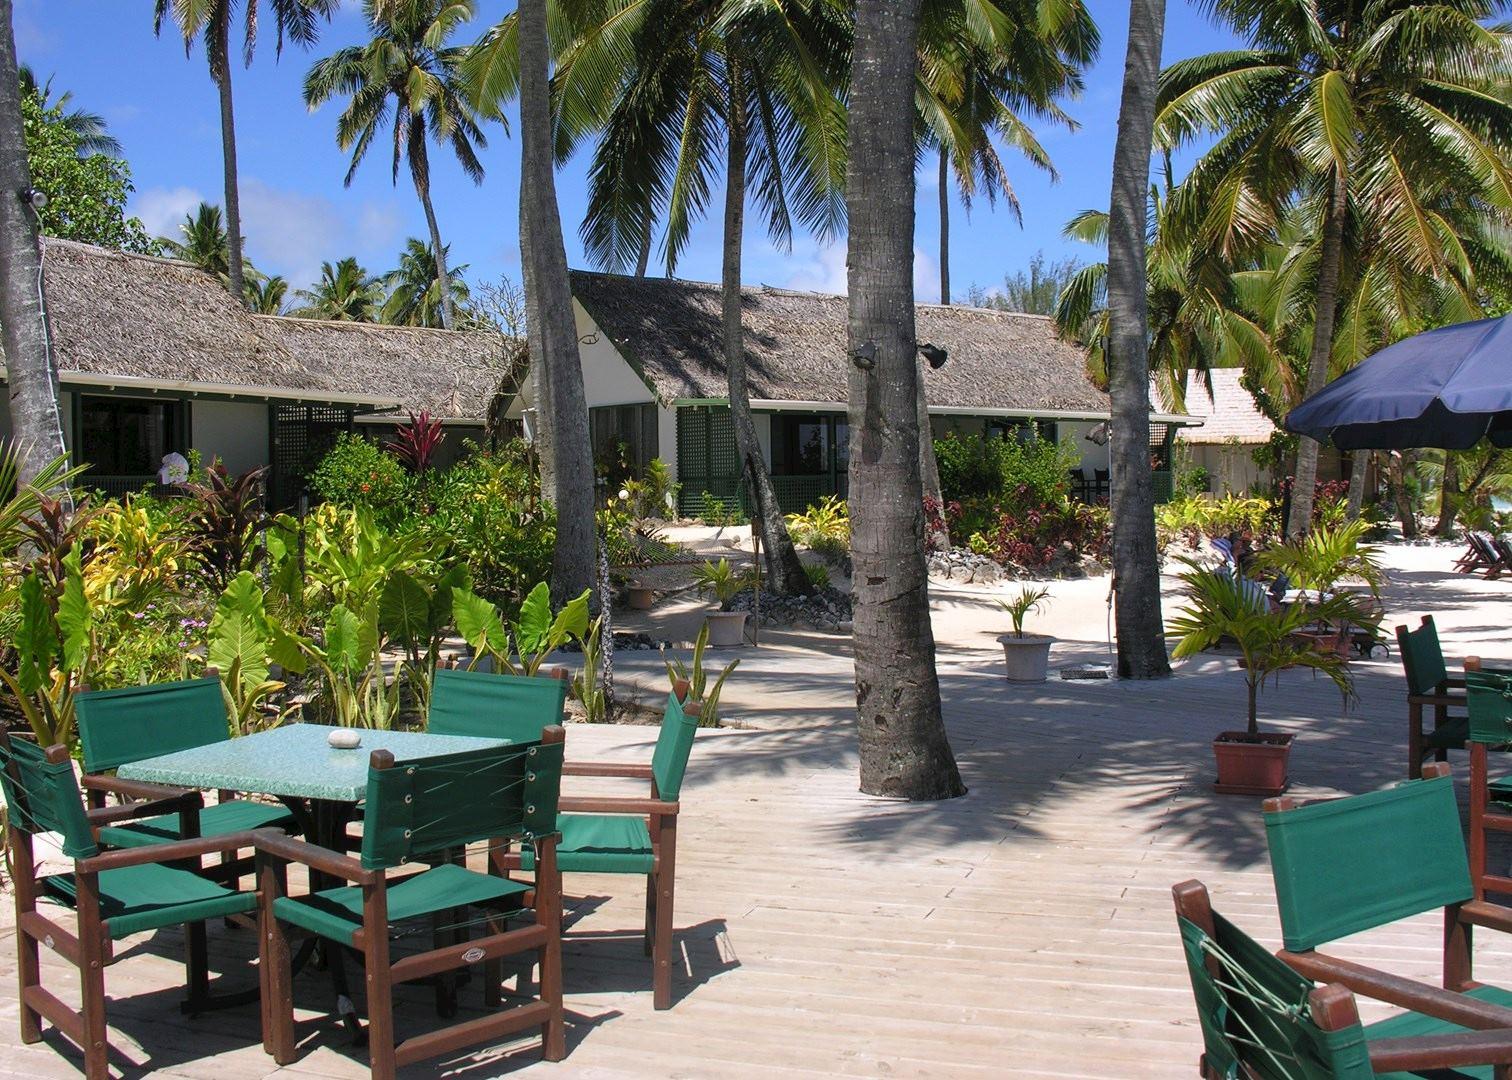 manuia beach boutique hotel rarotonga audley travel. Black Bedroom Furniture Sets. Home Design Ideas